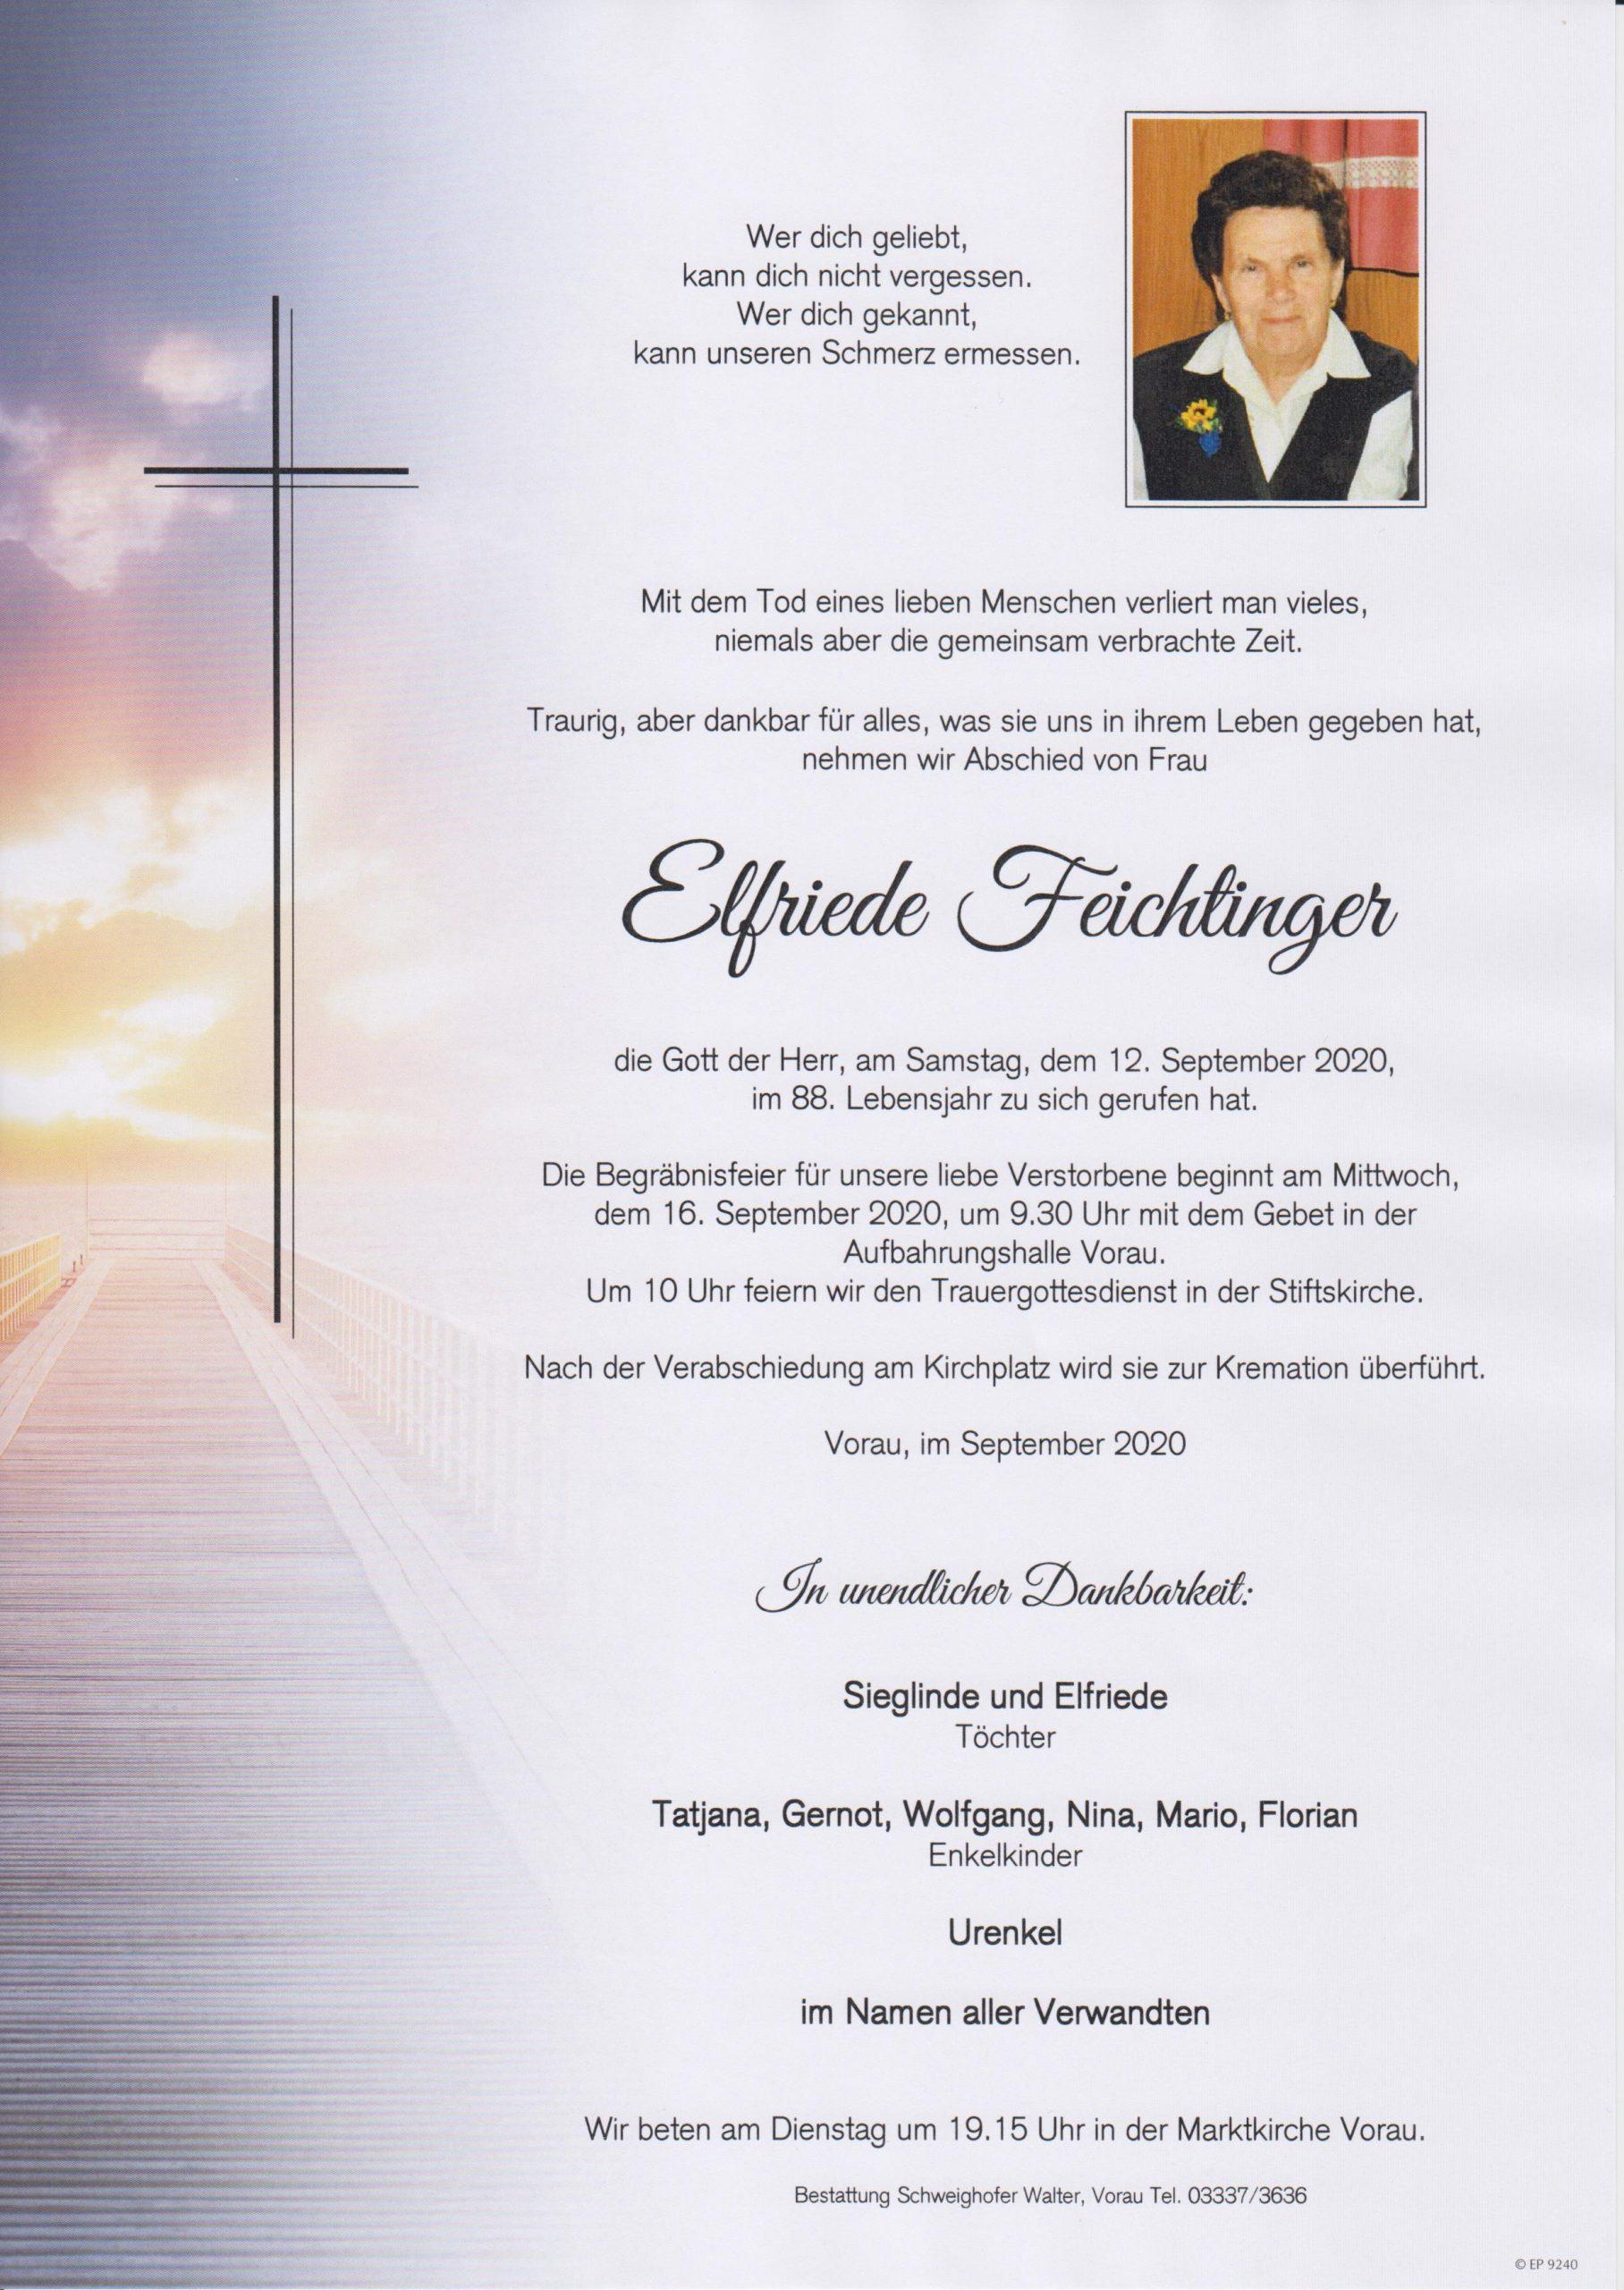 Elfriede Feichtinger